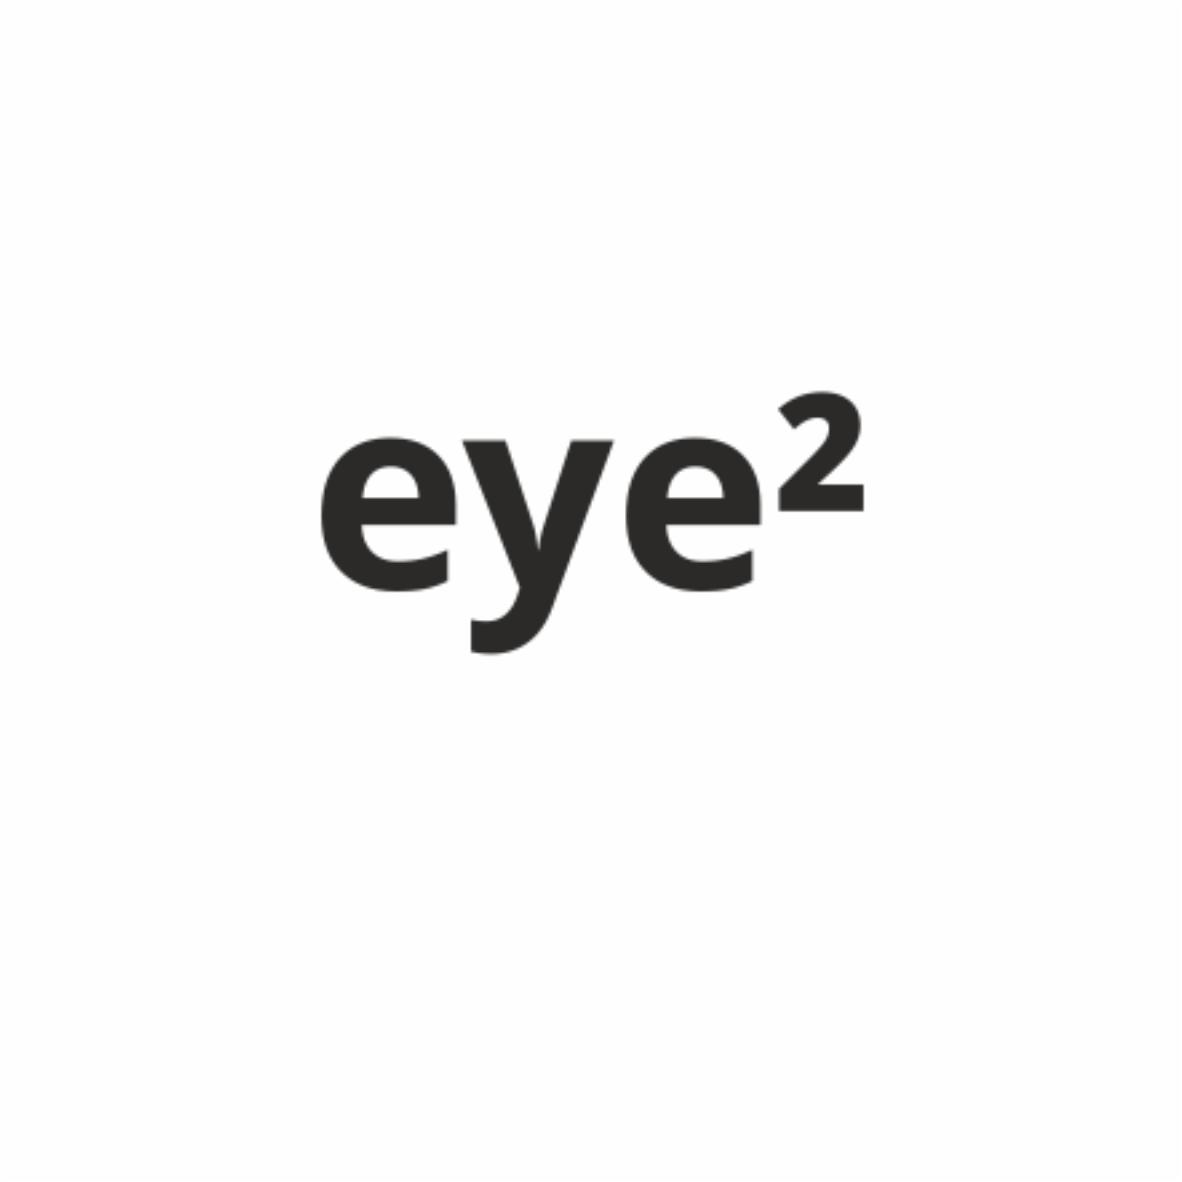 eye2_Logo_Markenseite